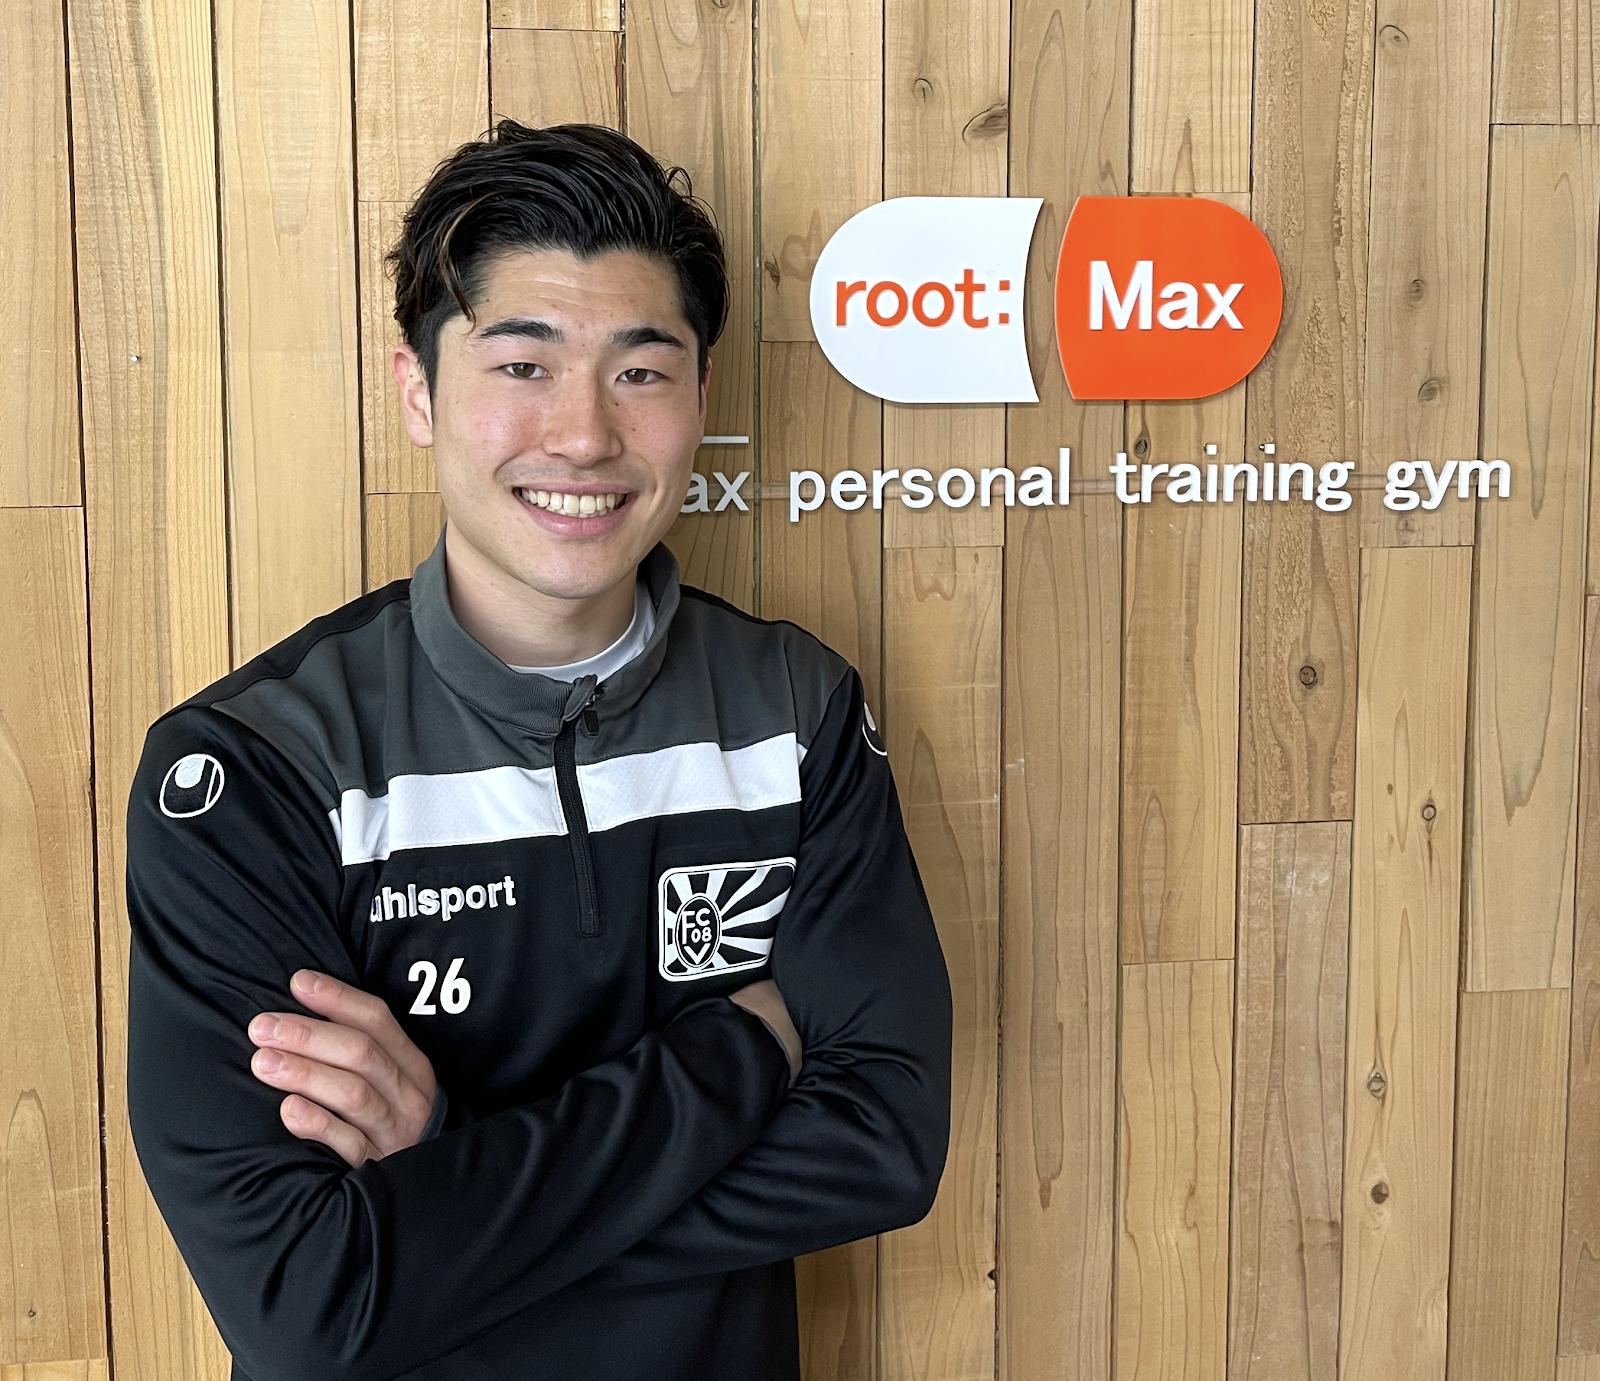 root:Maxパーソナルトレーニングジムの画像